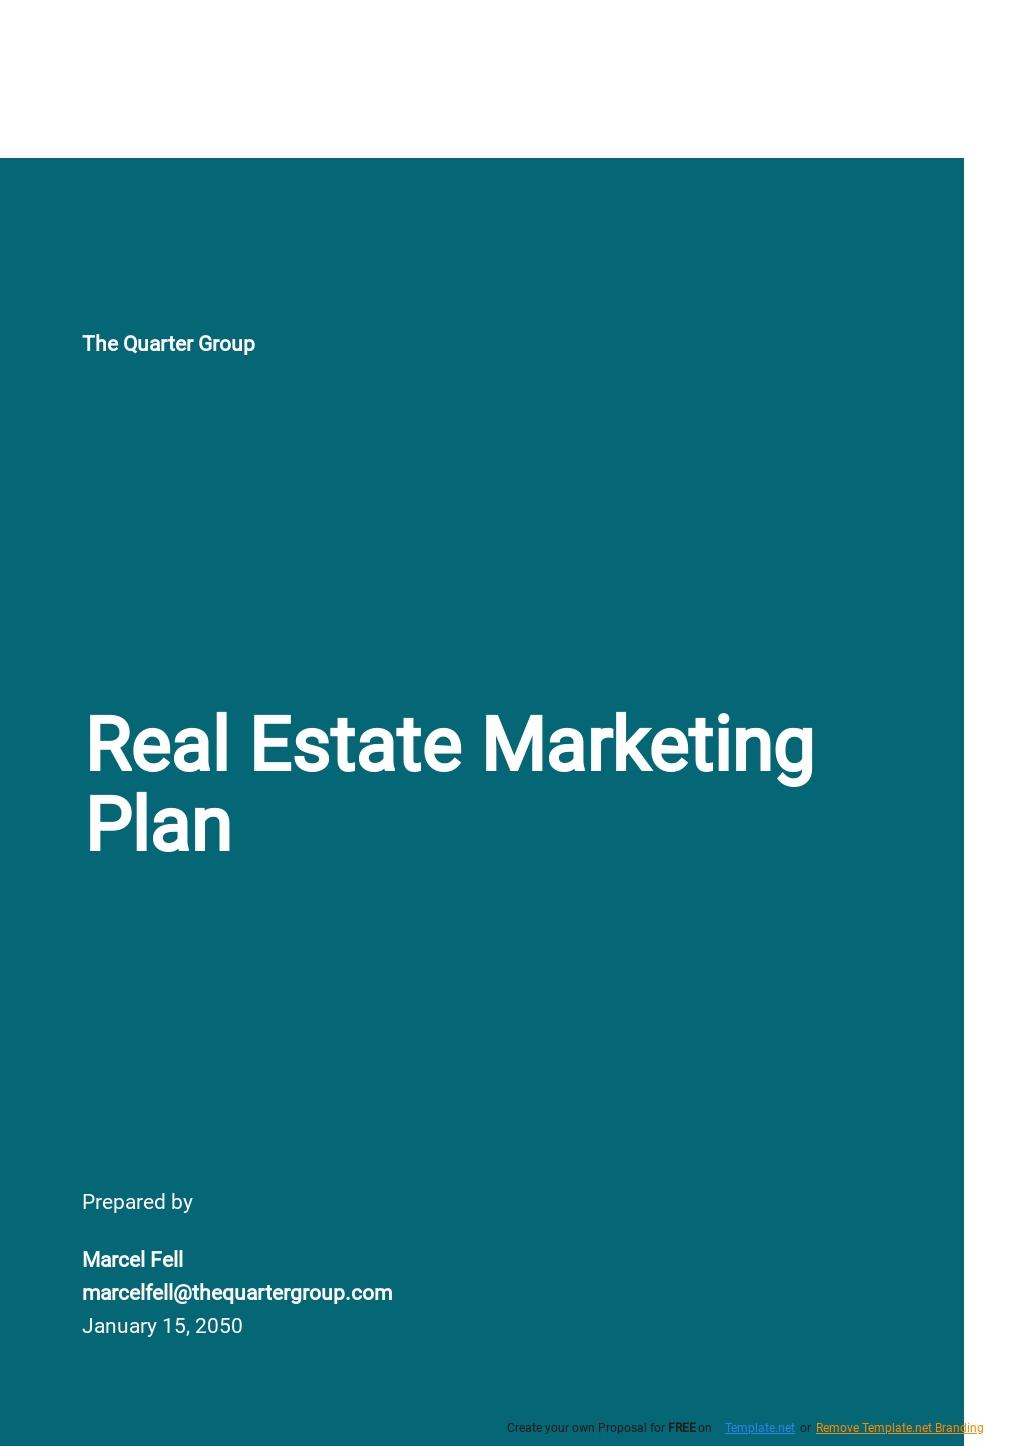 Real Estate Marketing Plan Template.jpe